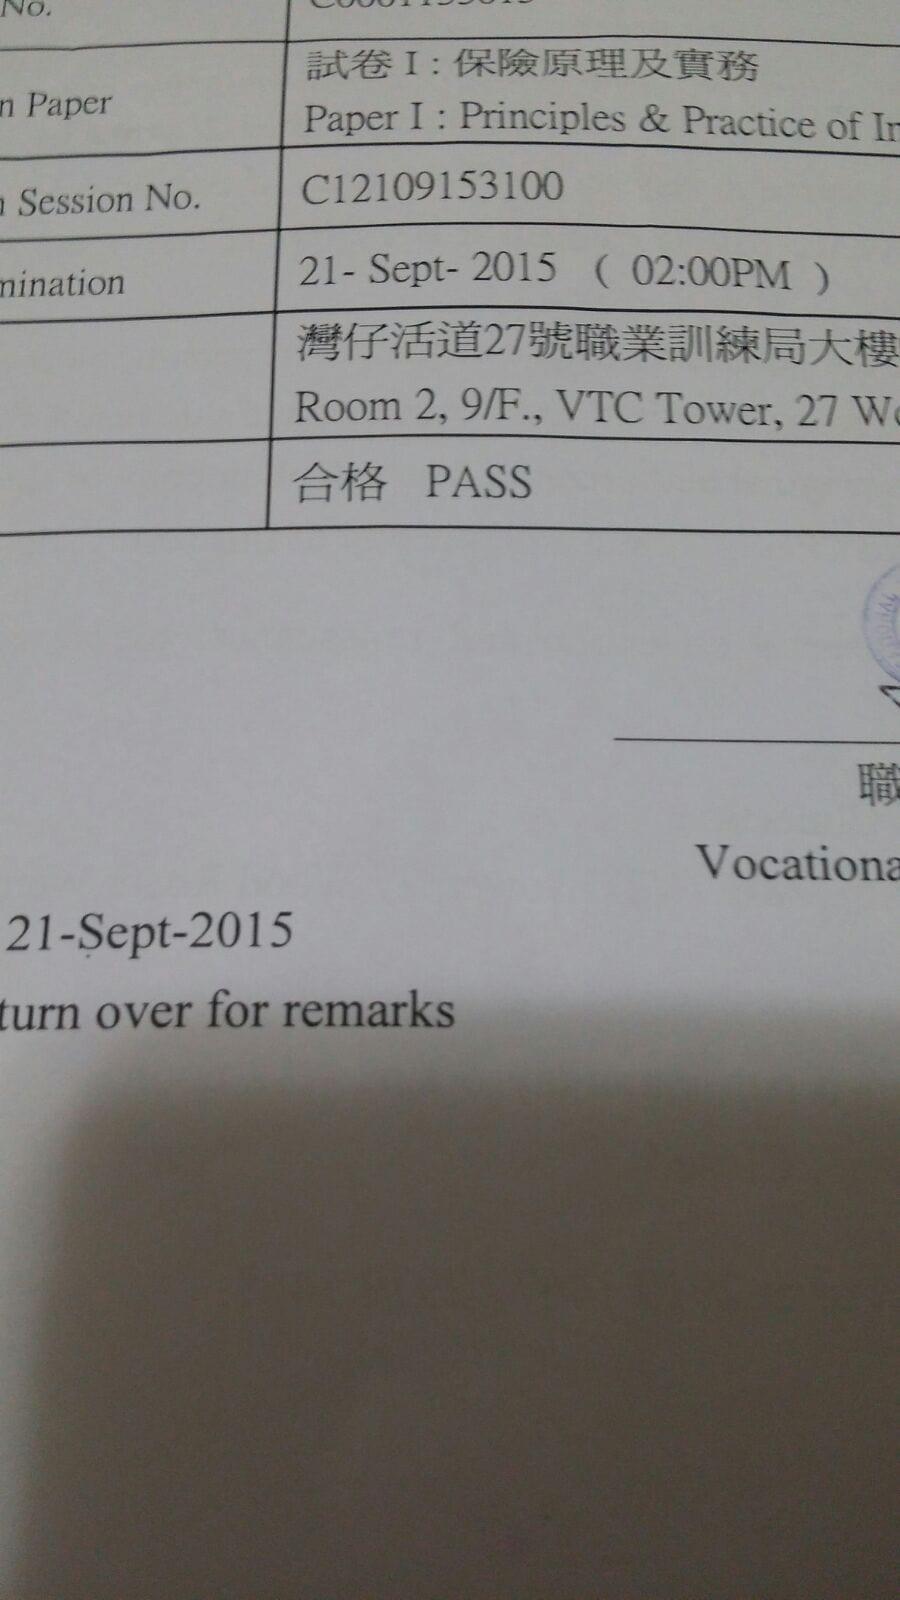 Wakeunchan 23/9/2015 IIQE Paper 1 Pass